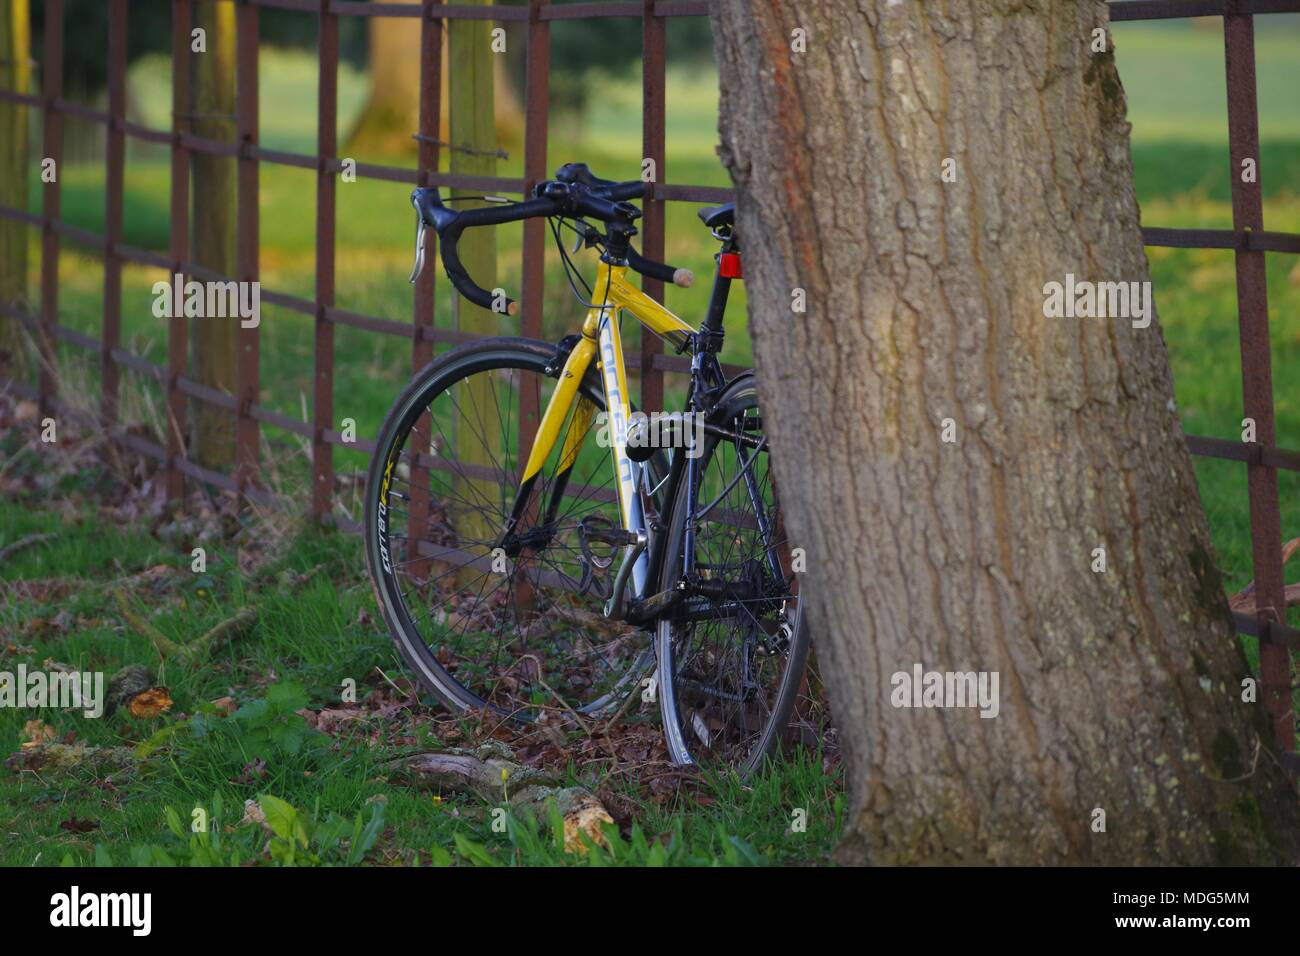 Yellow Racing Bike by an Iron Victorian Farm Fence and English Oak Tree Trunk. Powderham Estate, Exeter, Devon, UK. April, 2018. - Stock Image